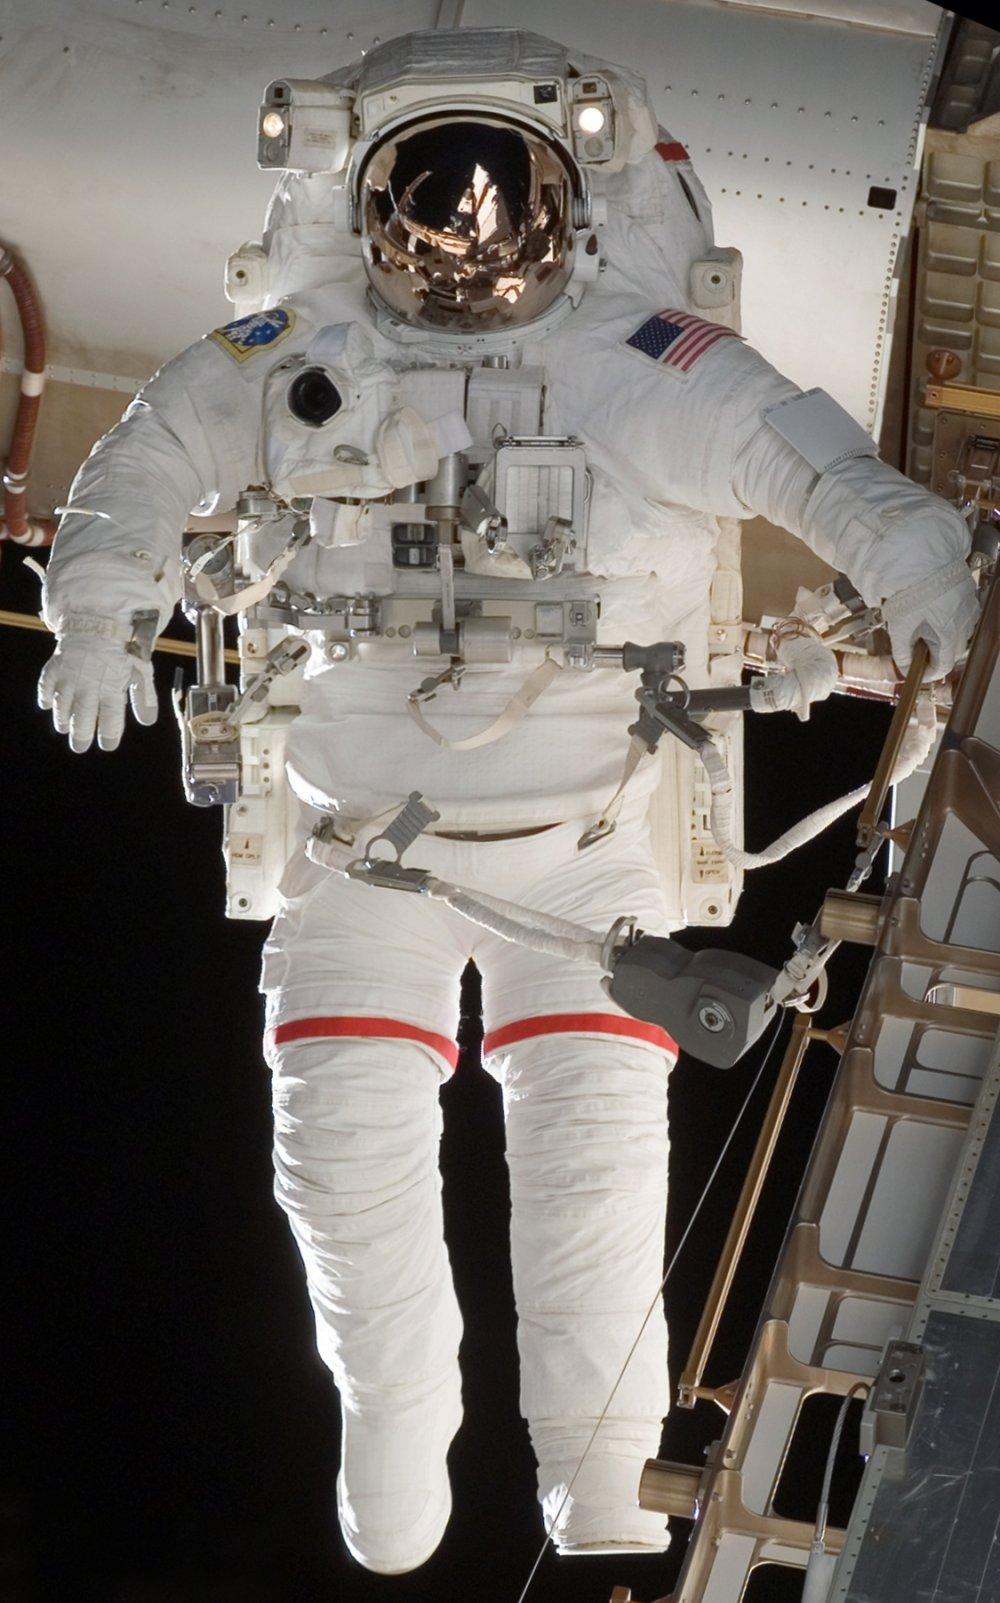 STS-118 EVA EMU Suit